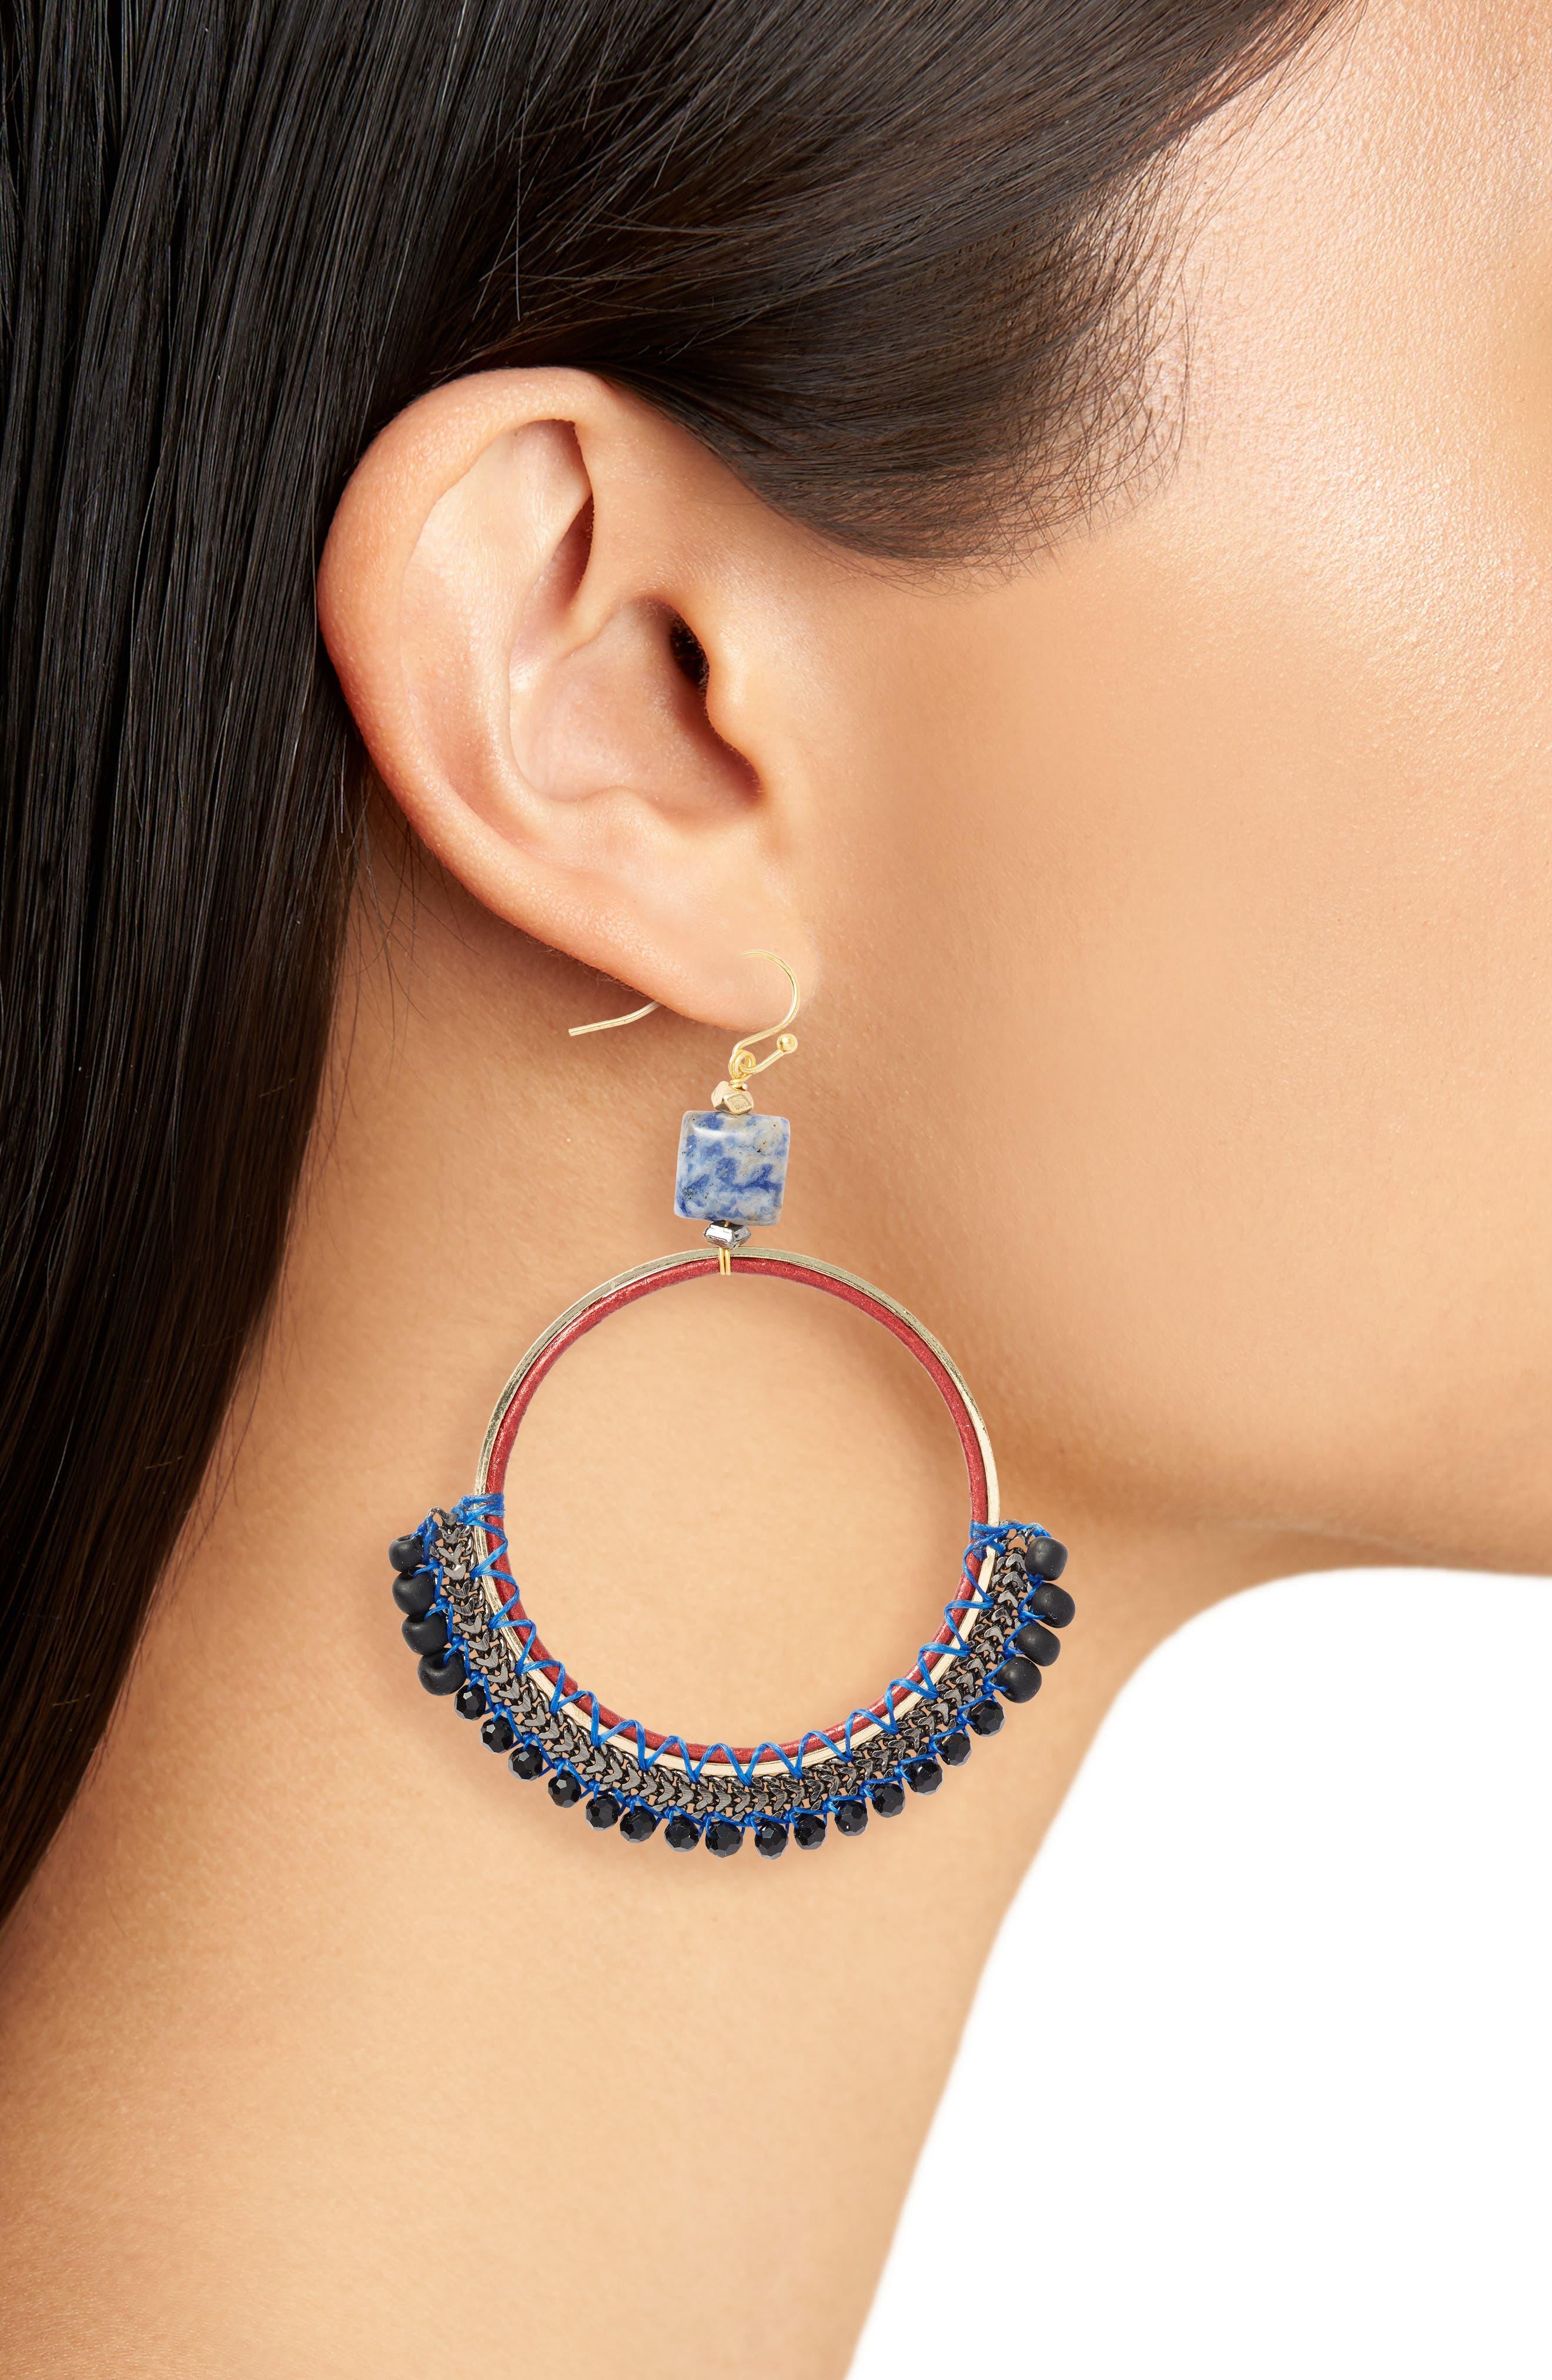 Bachubai Crystal & Chain Hoop Earrings,                             Alternate thumbnail 2, color,                             400